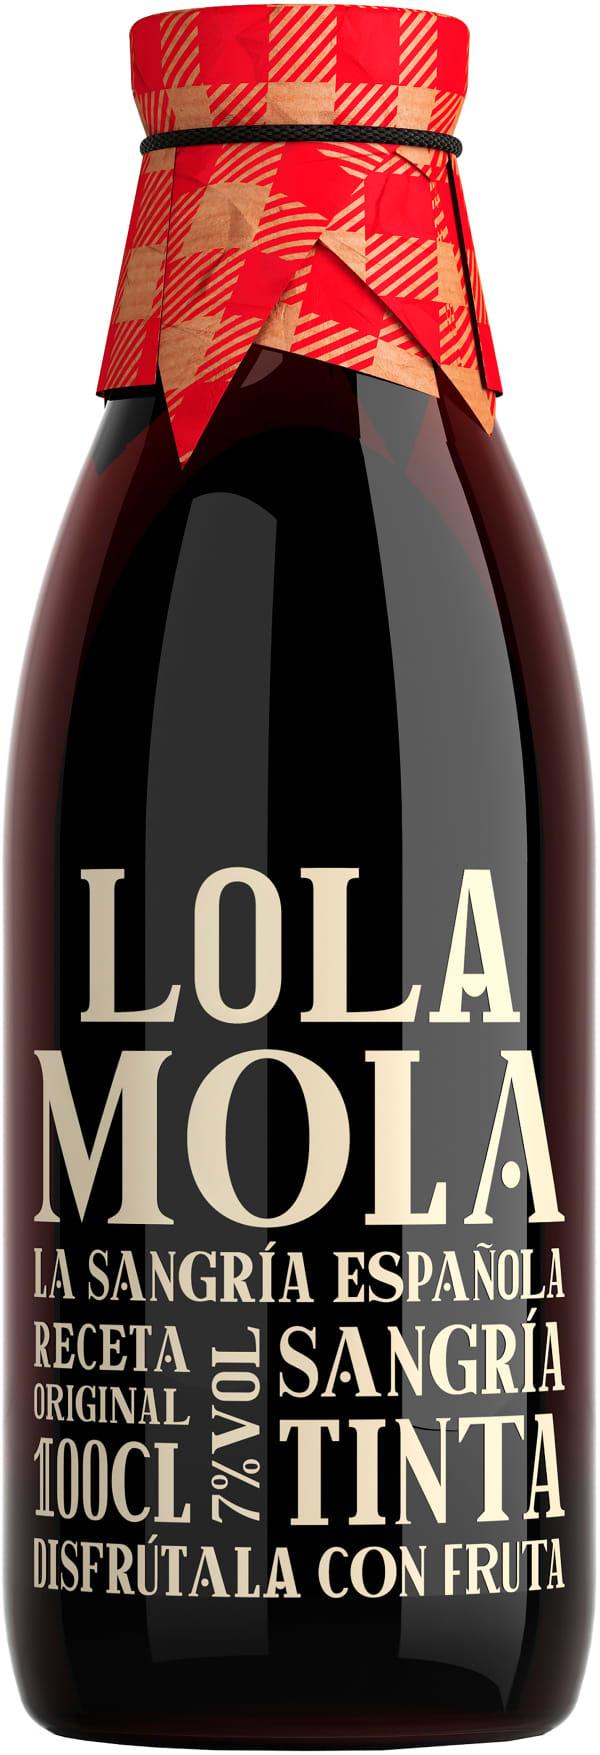 Lola Mola Sangria 2017